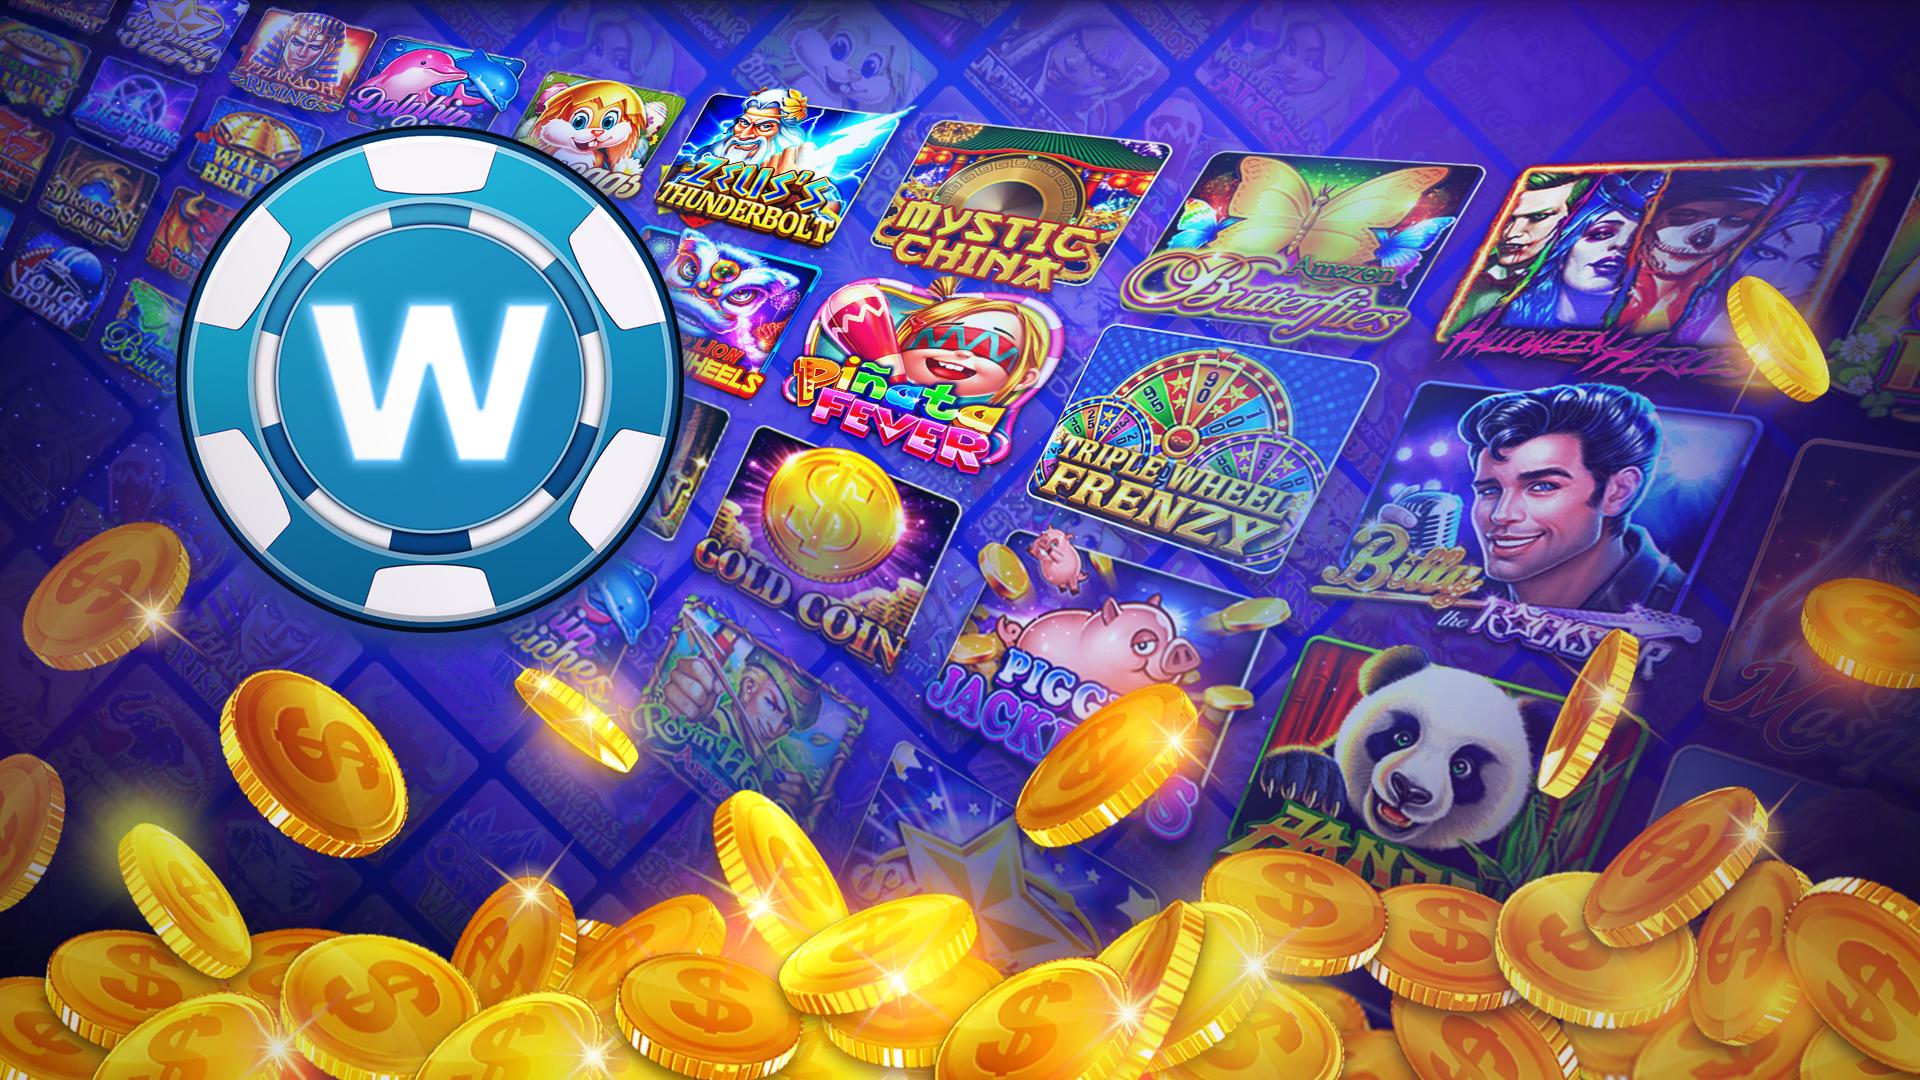 Chip Gratis Doubleu Casino - Free Slots